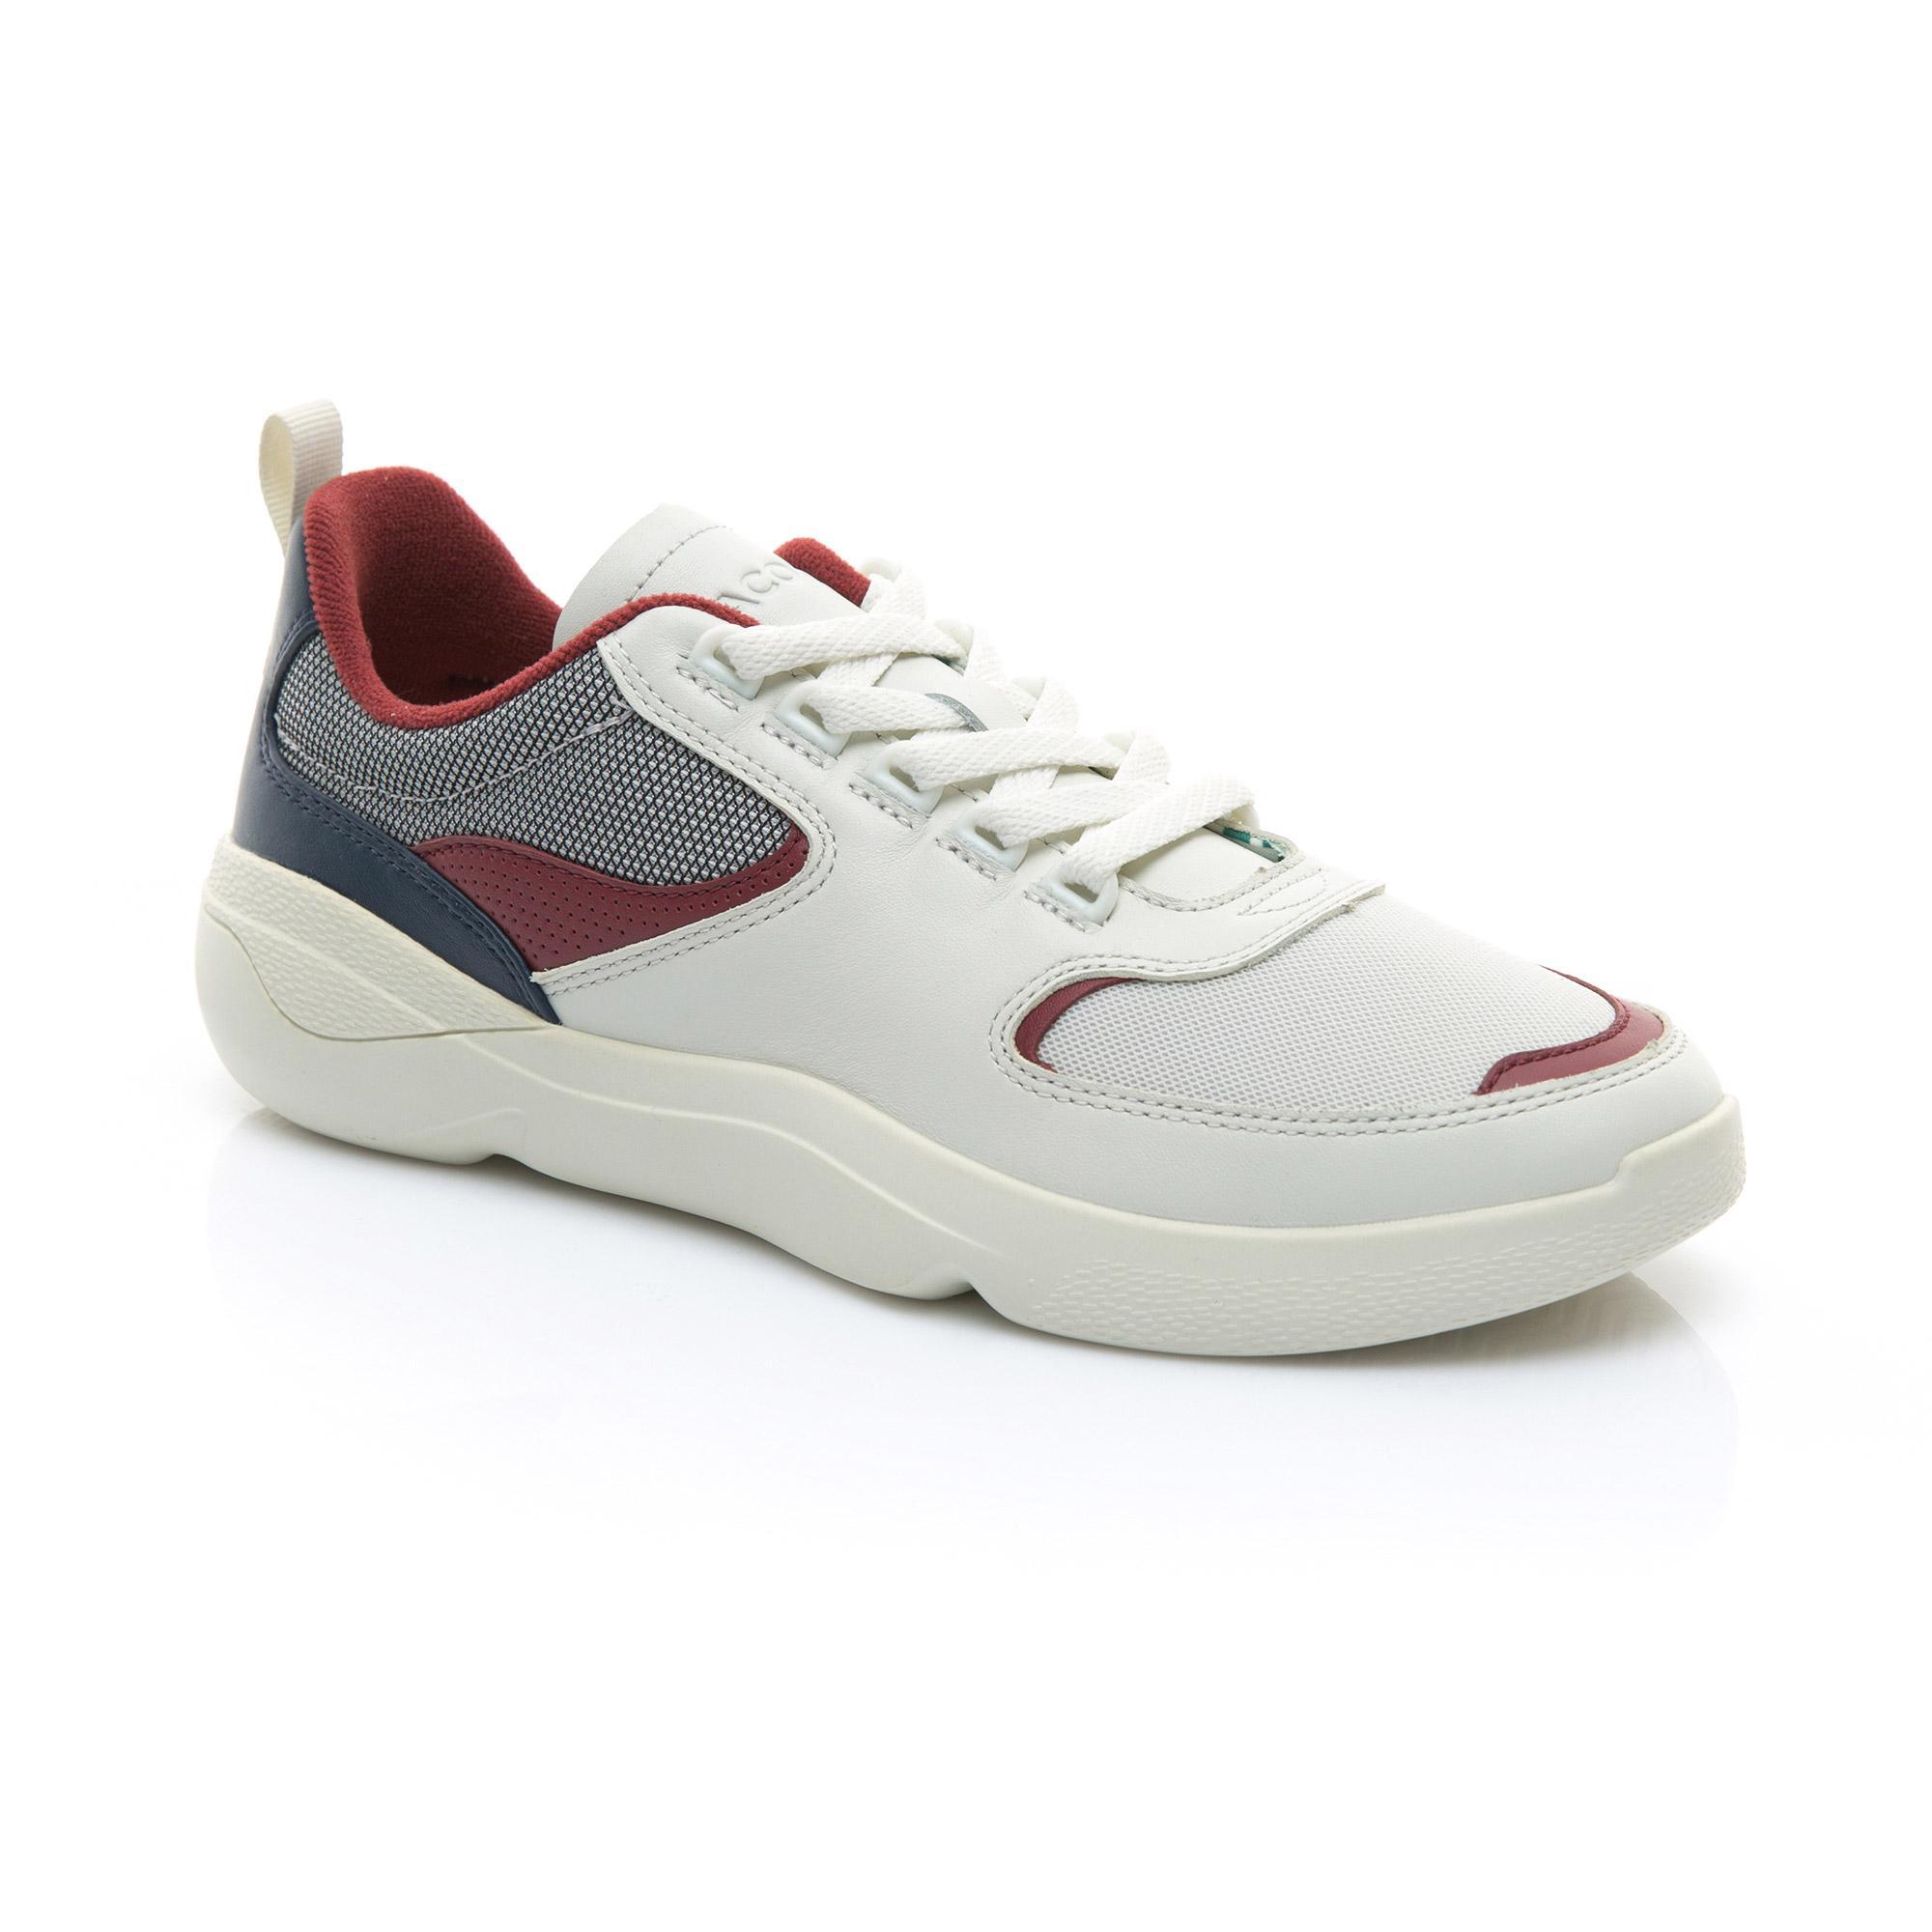 Lacoste Erkek Bej - Koyu Kirmizi Wildcard 119 1 Sneaker